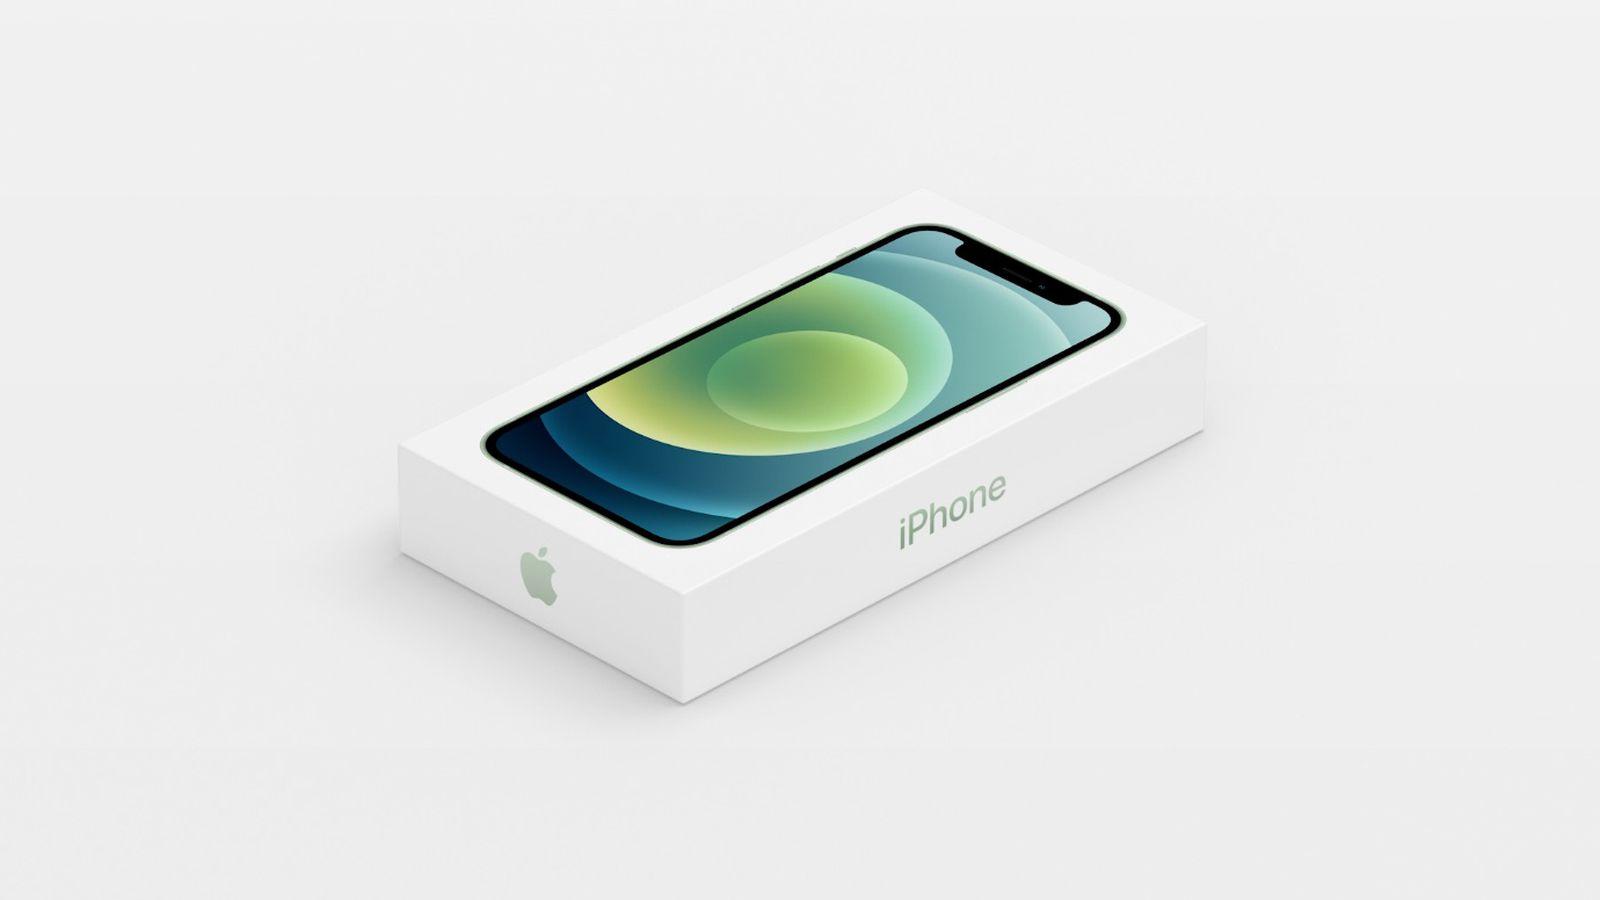 IMAGEM: Promotores de iPhone